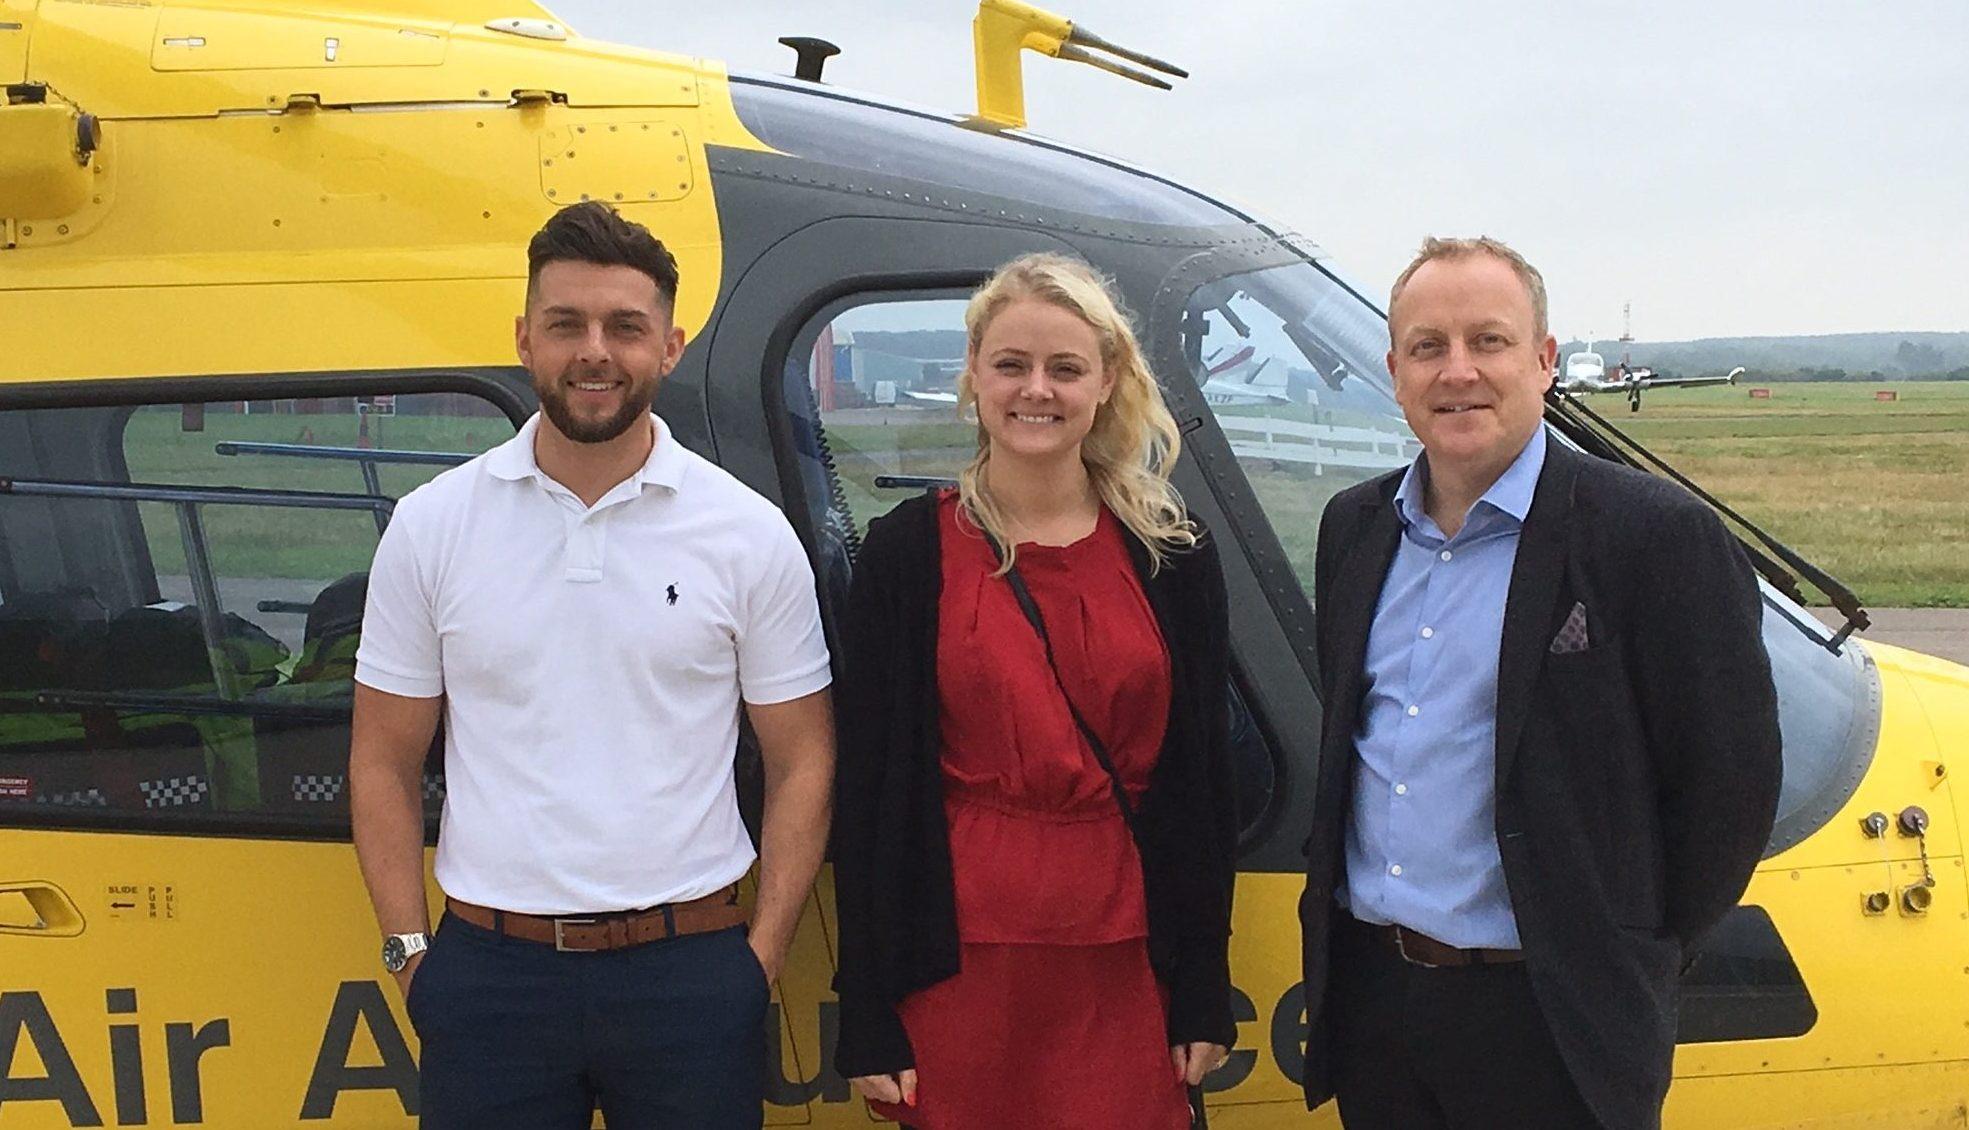 O'Brien Charitable Trust visit Air Ambulance Base